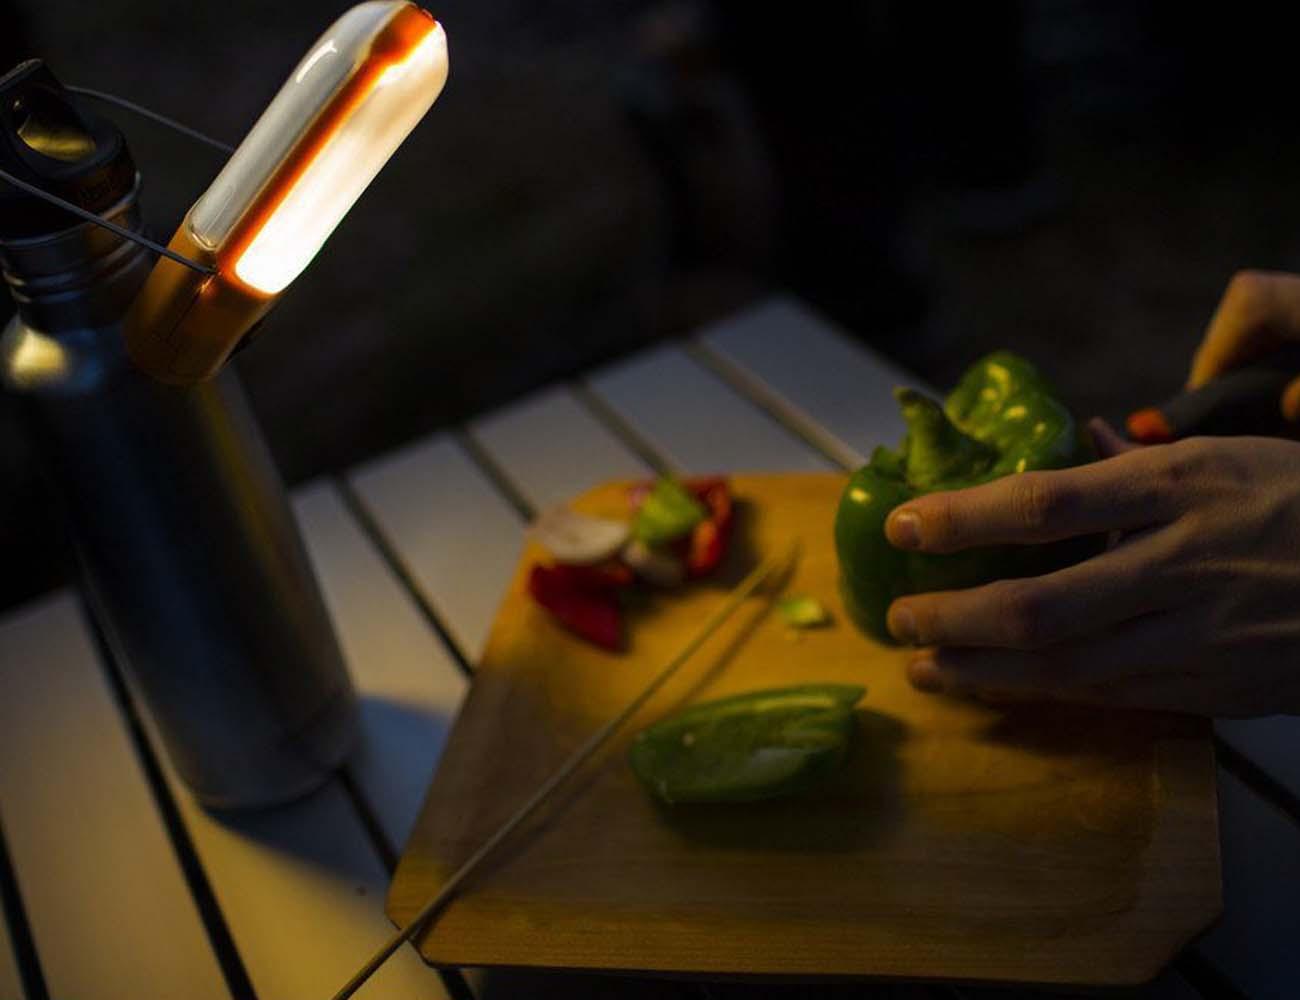 NanoGrid – Lighting & Charging Hub by BioLite